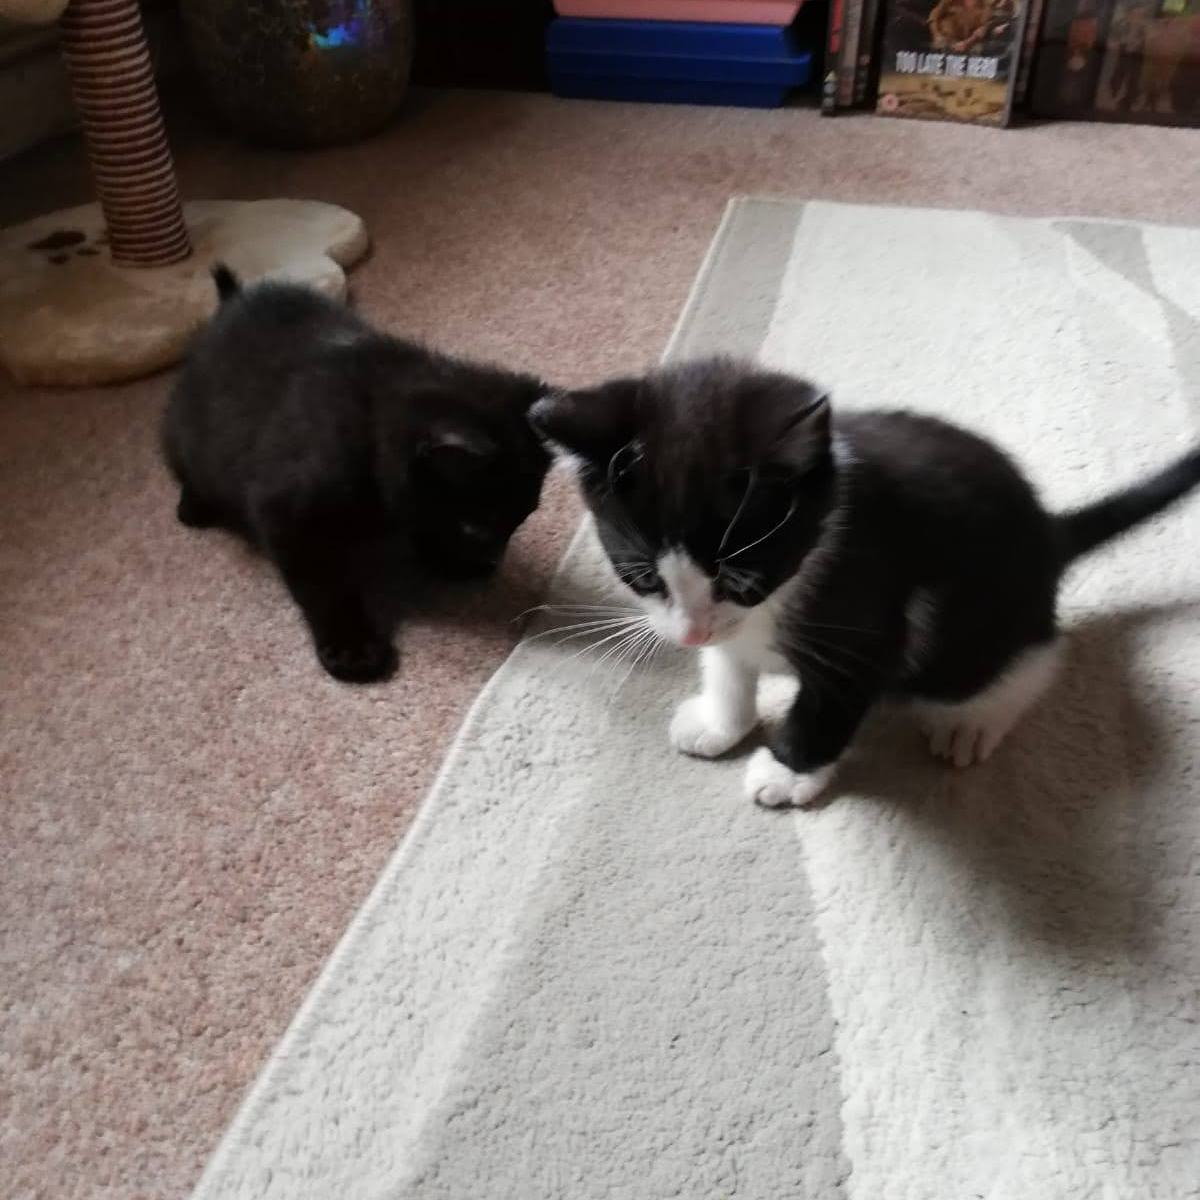 2 small kittens